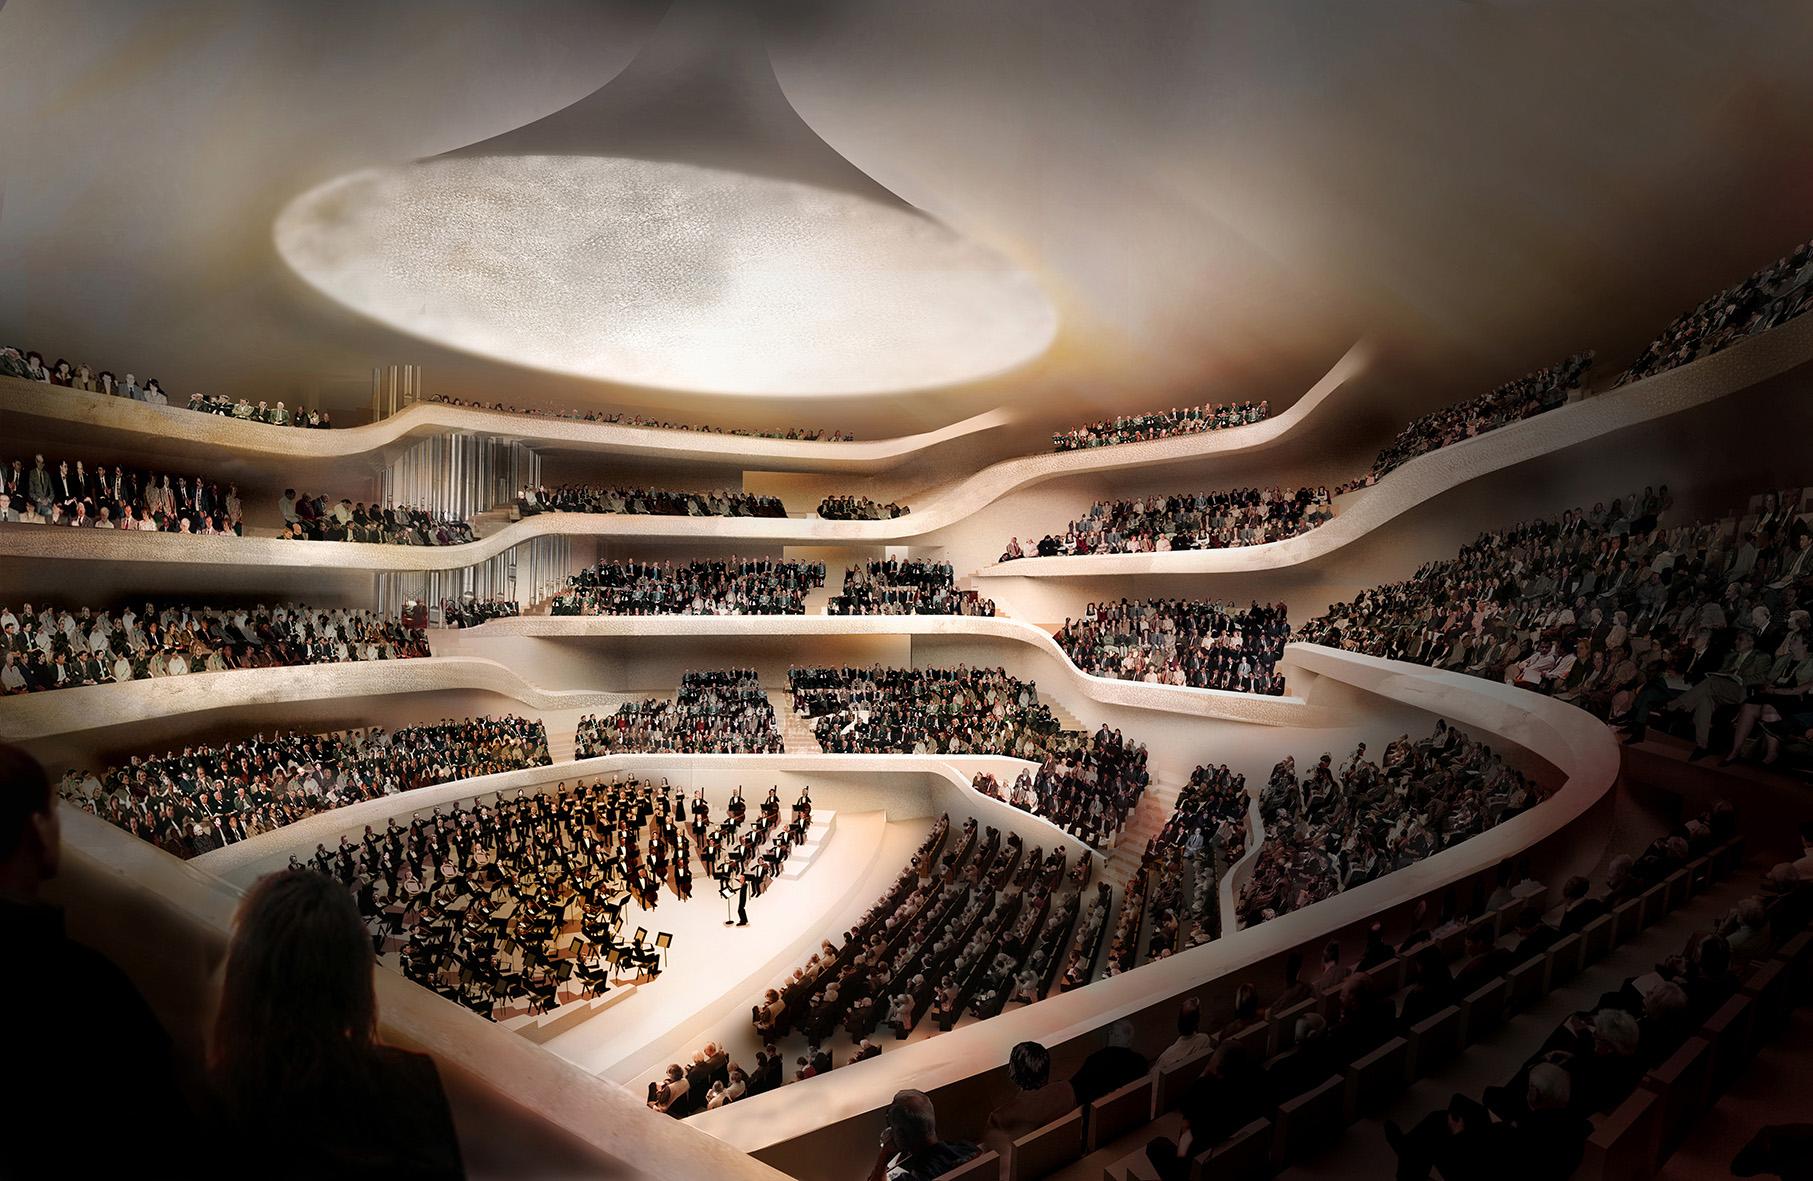 Bild: Elbphilharmonie - Großer Saal